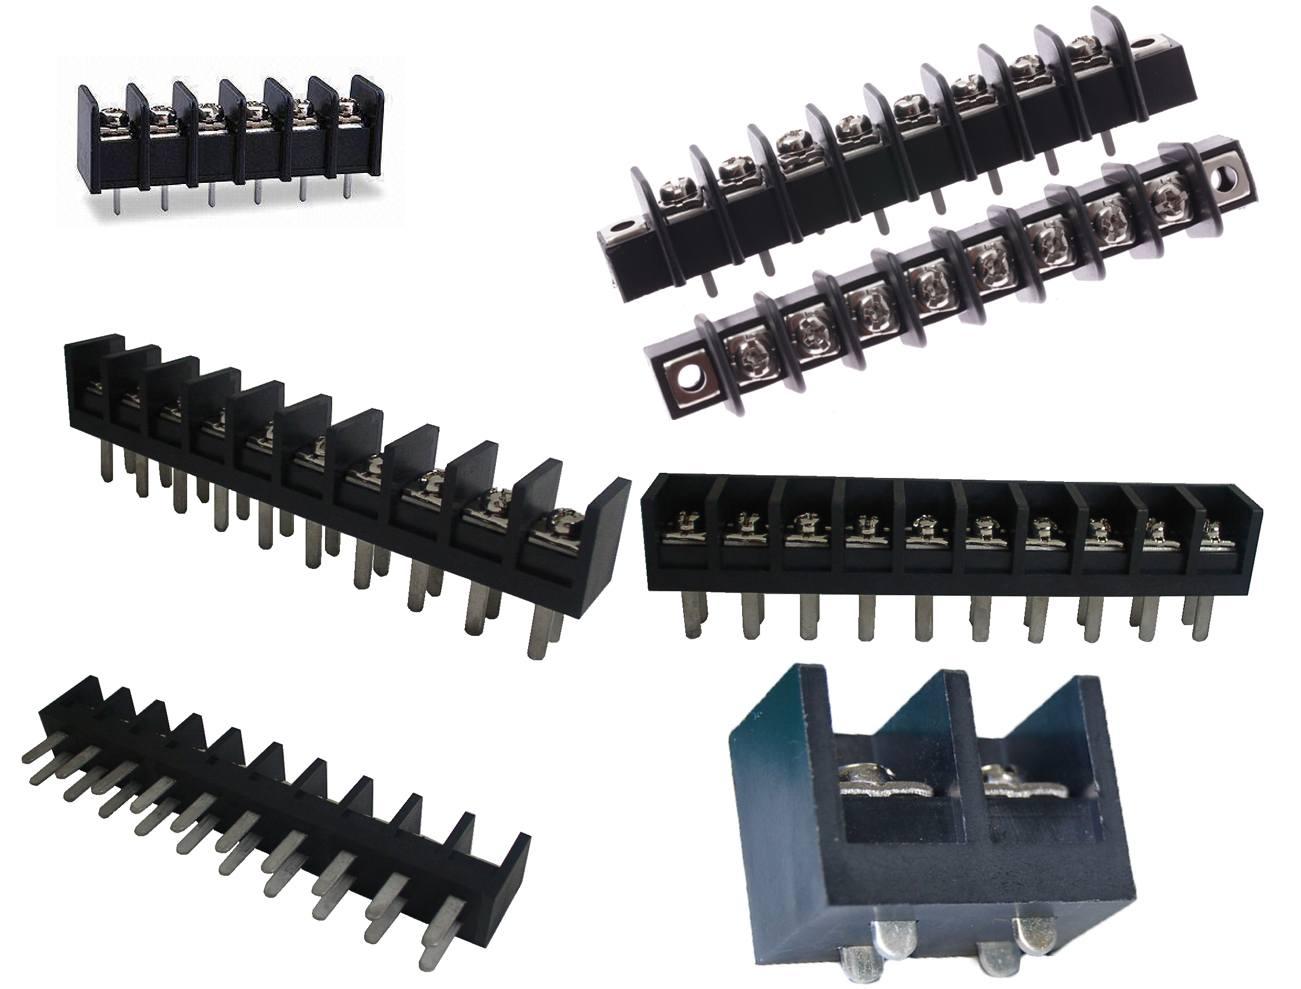 印刷電路板端子台 - 印刷電路板端子台